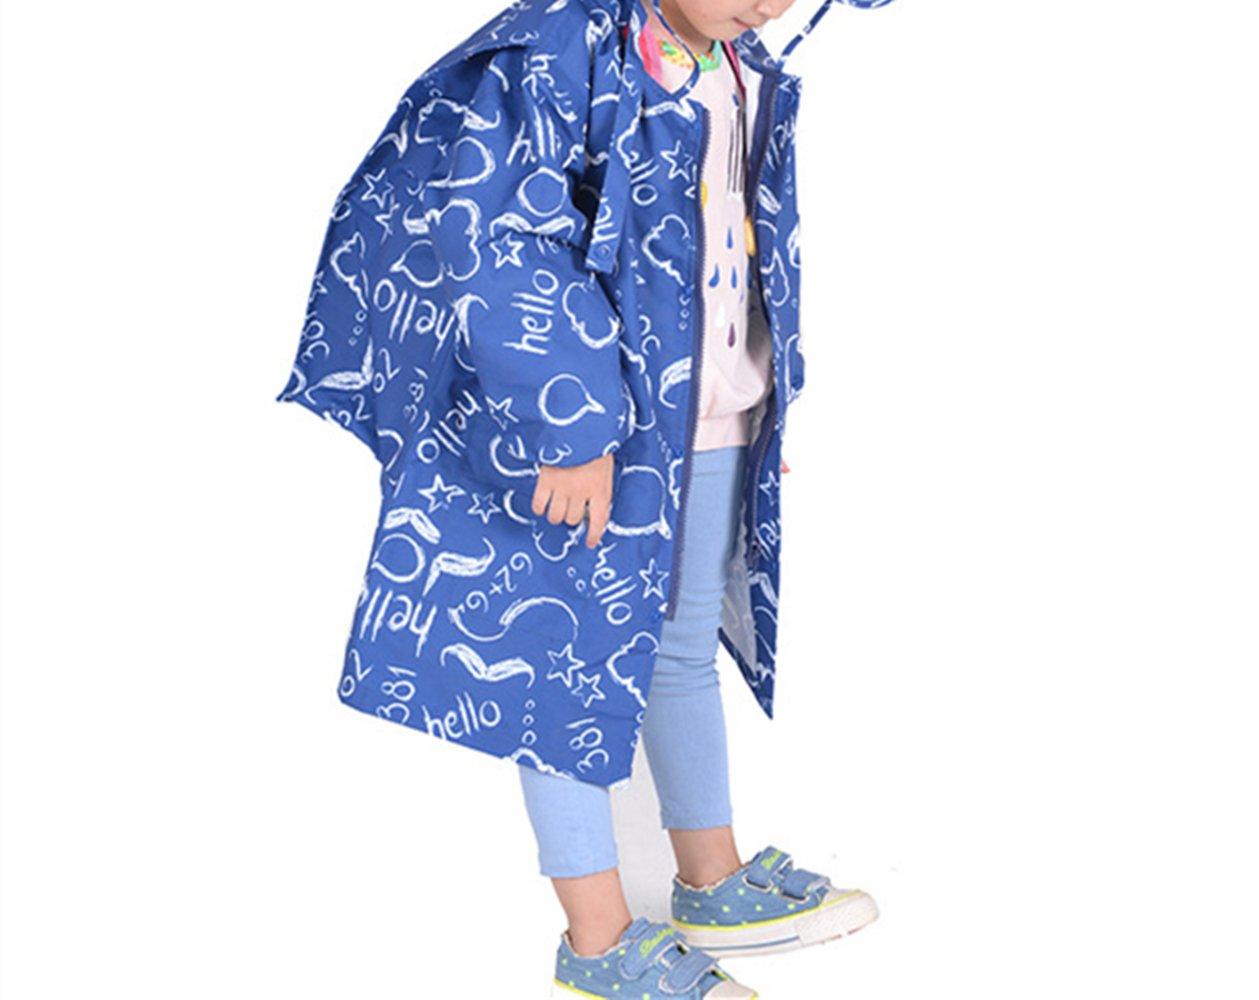 zhbotaolang Kids Raincoat Girl Boy Waterproof with School Bag Cover Dark Blue XXXL